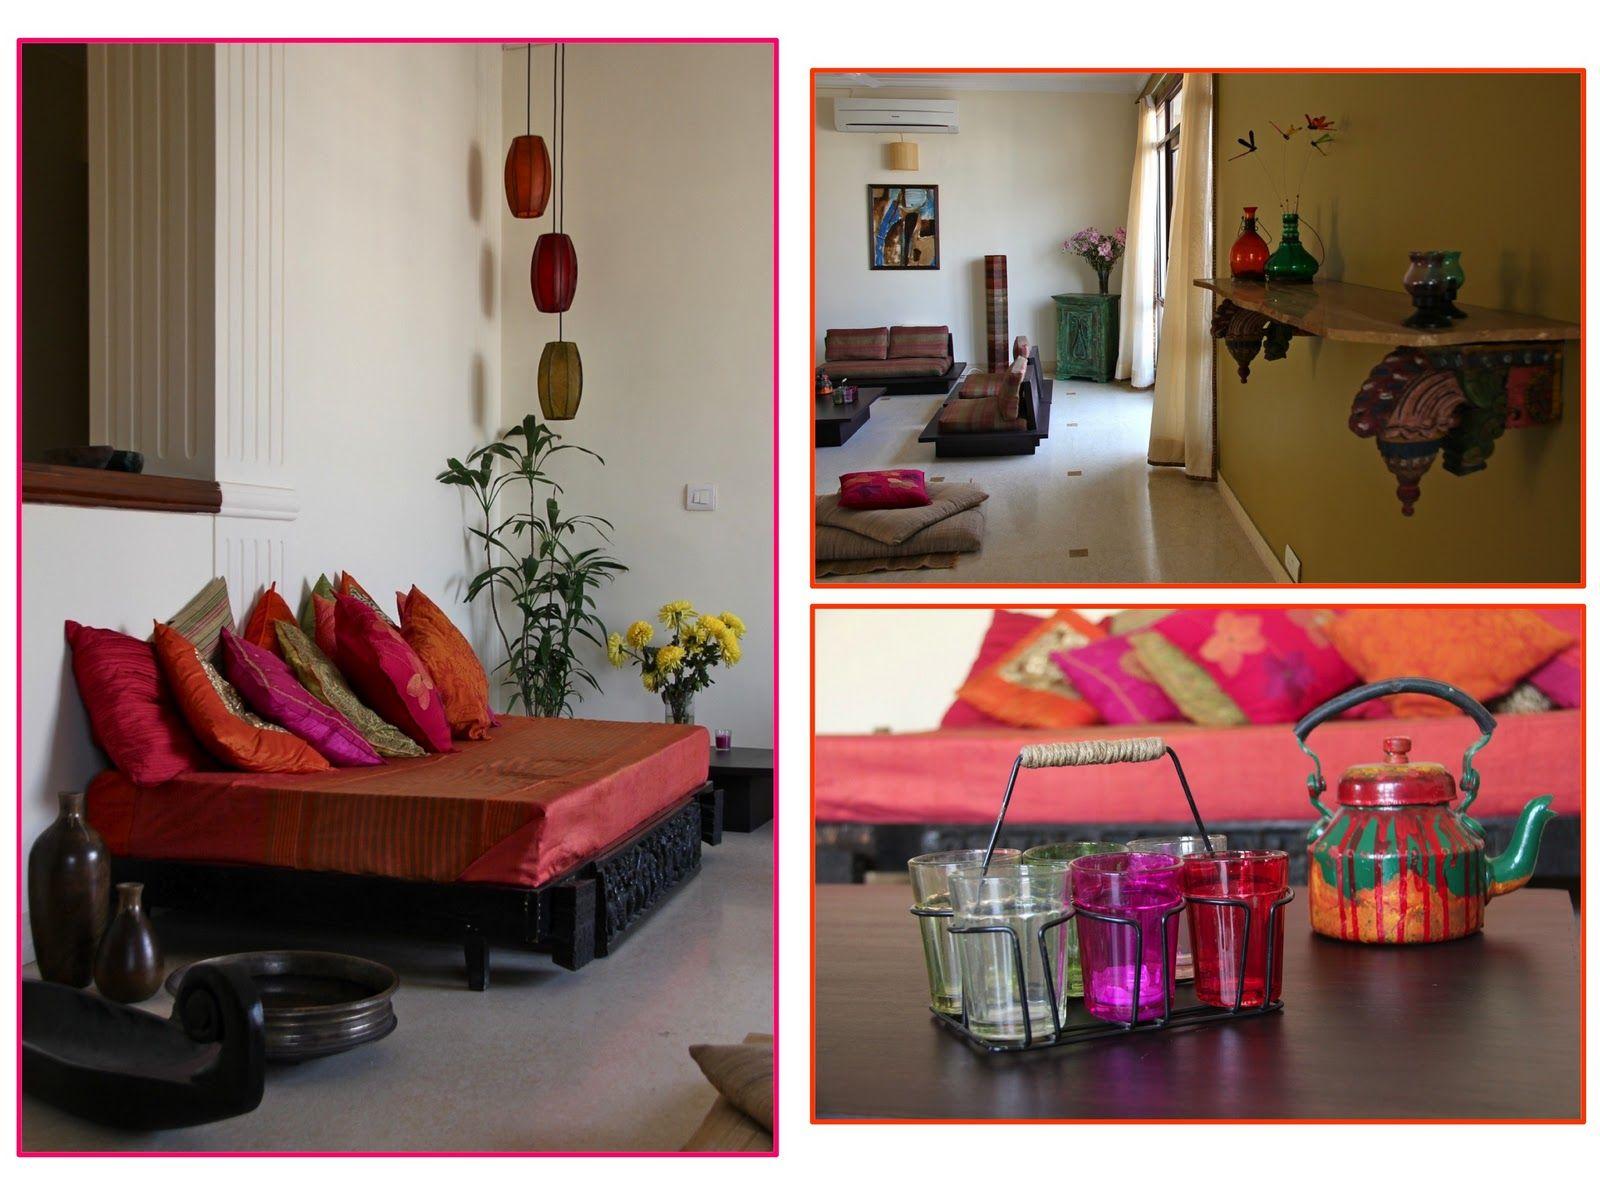 Home interior design gurgaon home is where the art is upasana u debus penthouse in gurgaon